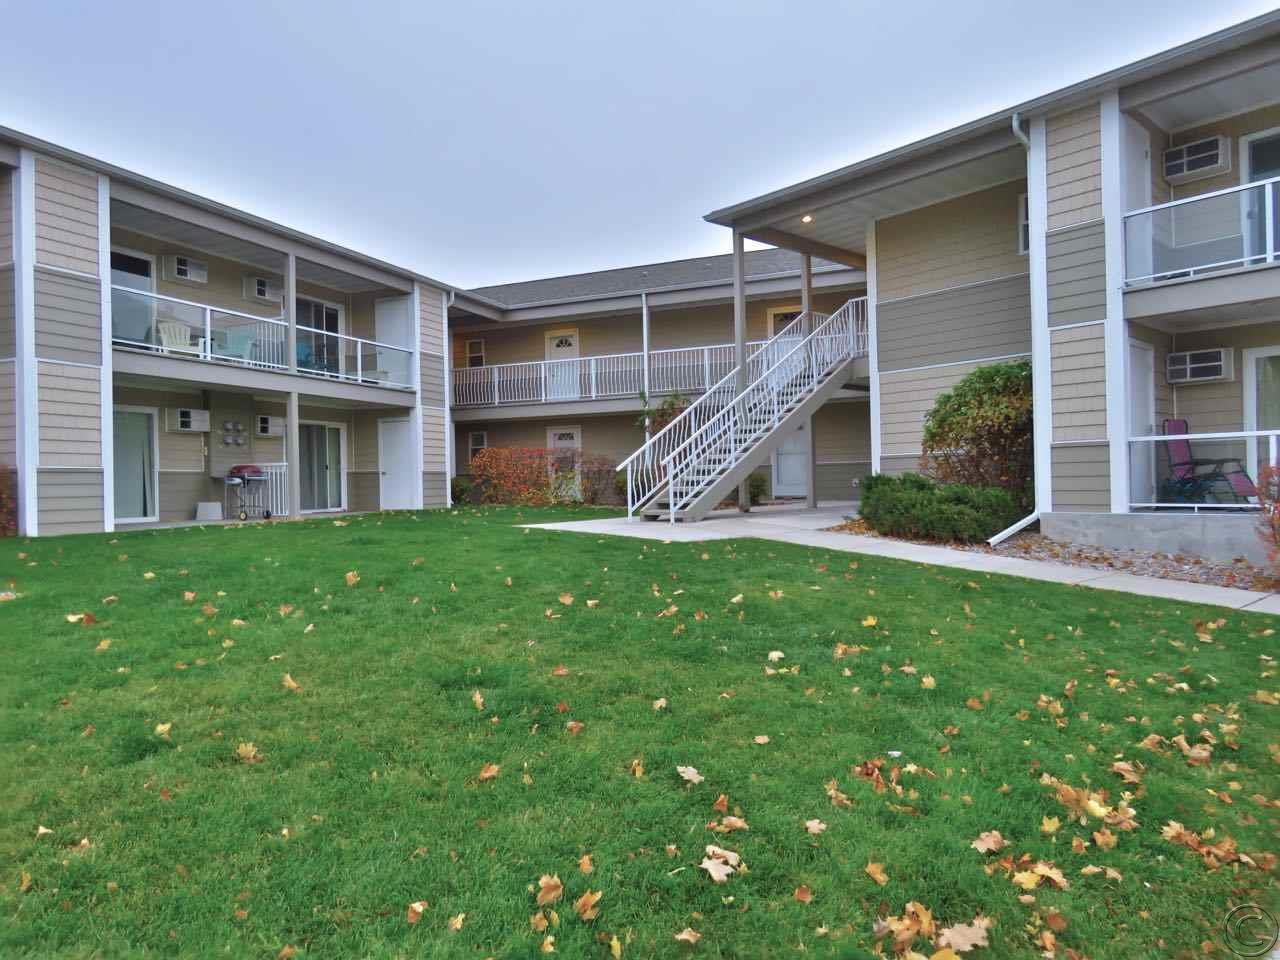 Real Estate for Sale, ListingId: 36216870, Polson,MT59860